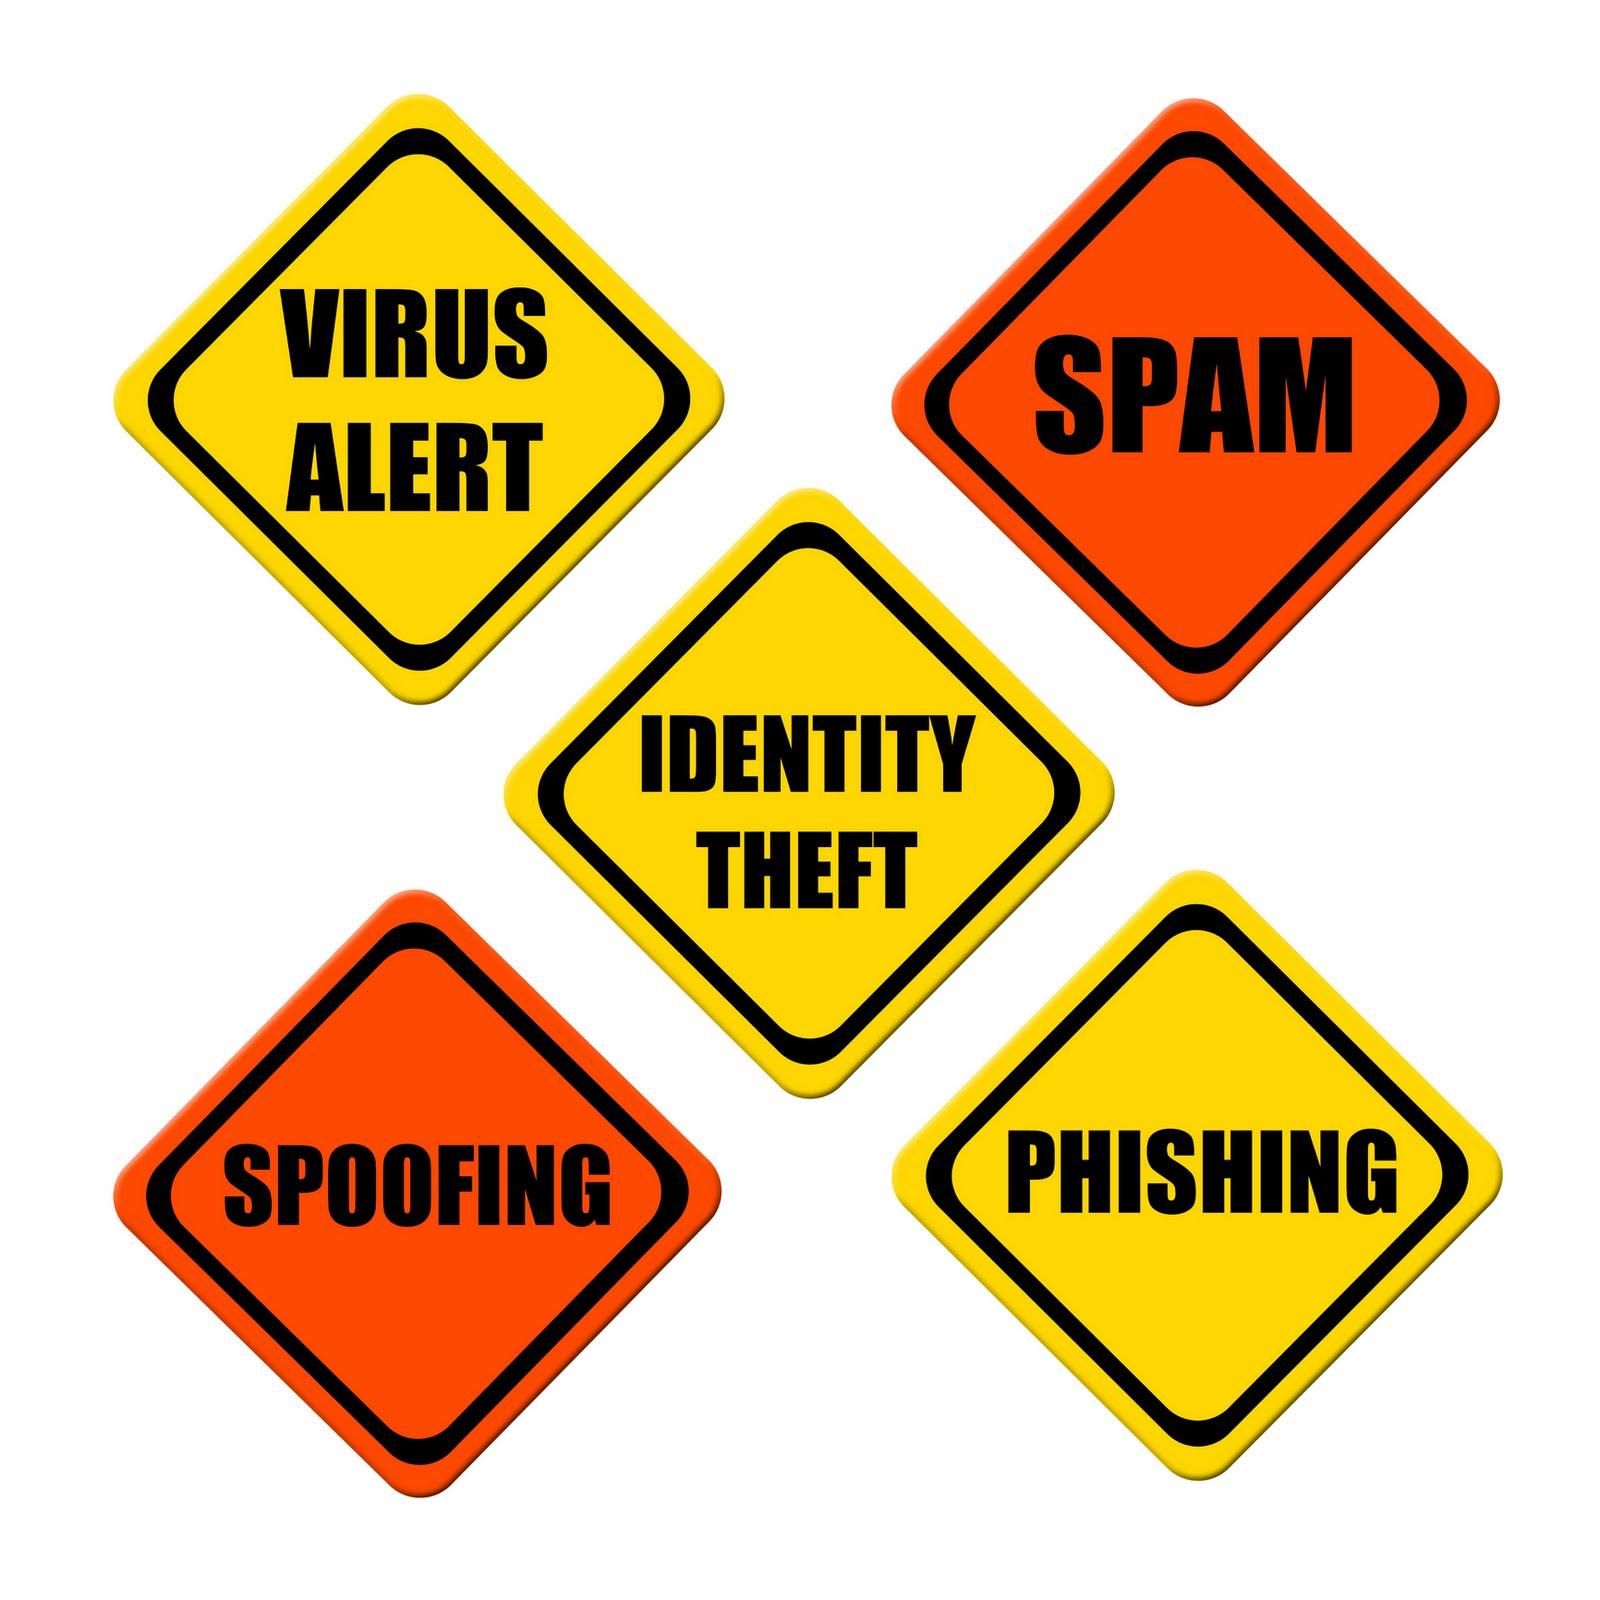 Risks: Internet Safety 2011: February 2011